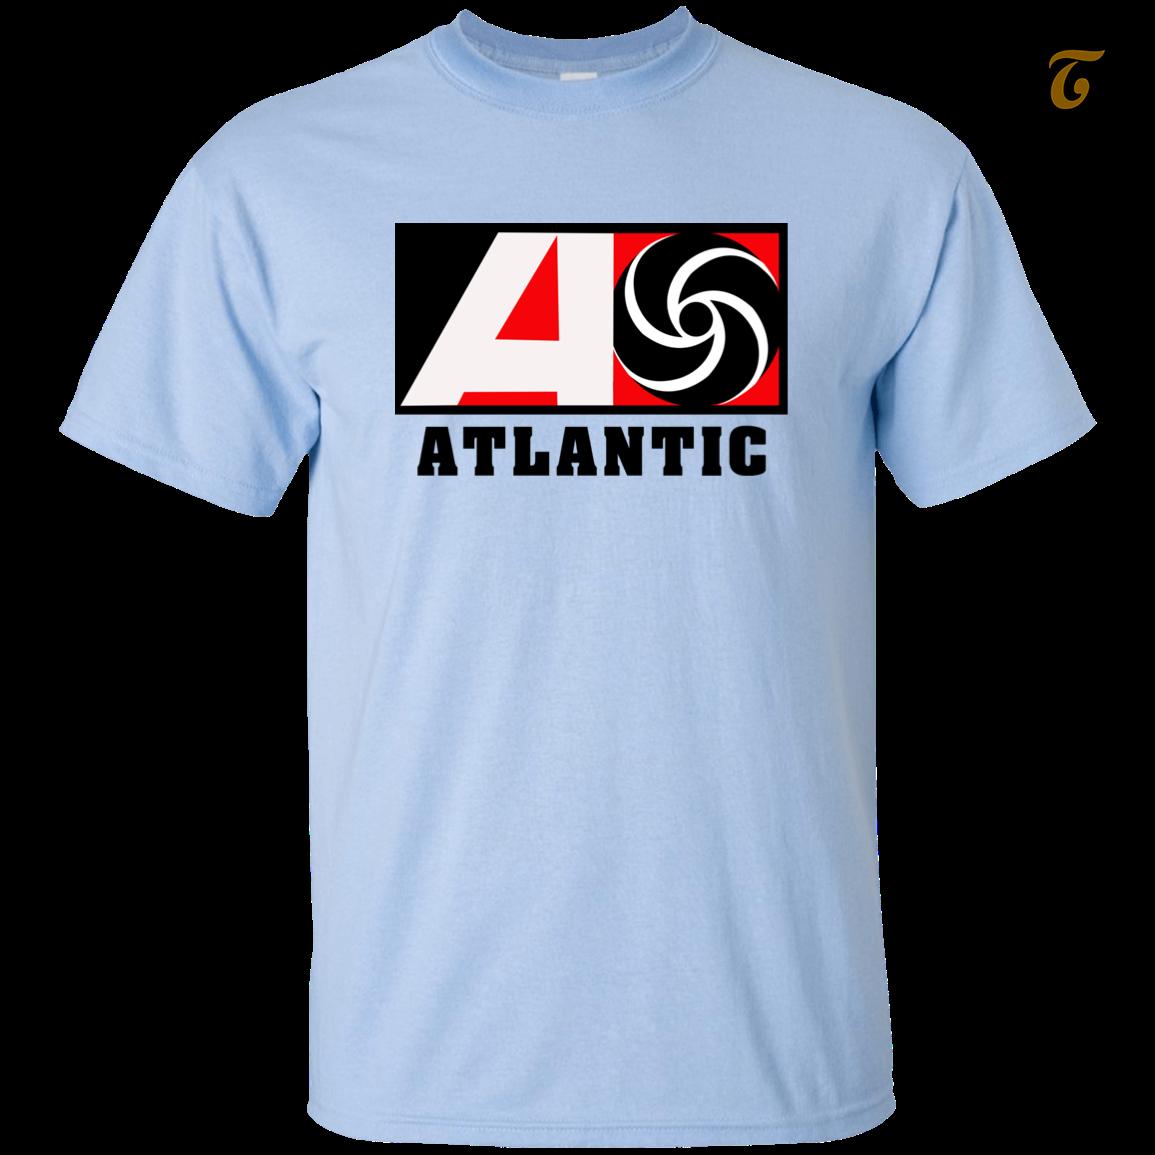 Atlantic records record label men t shirt   light blue